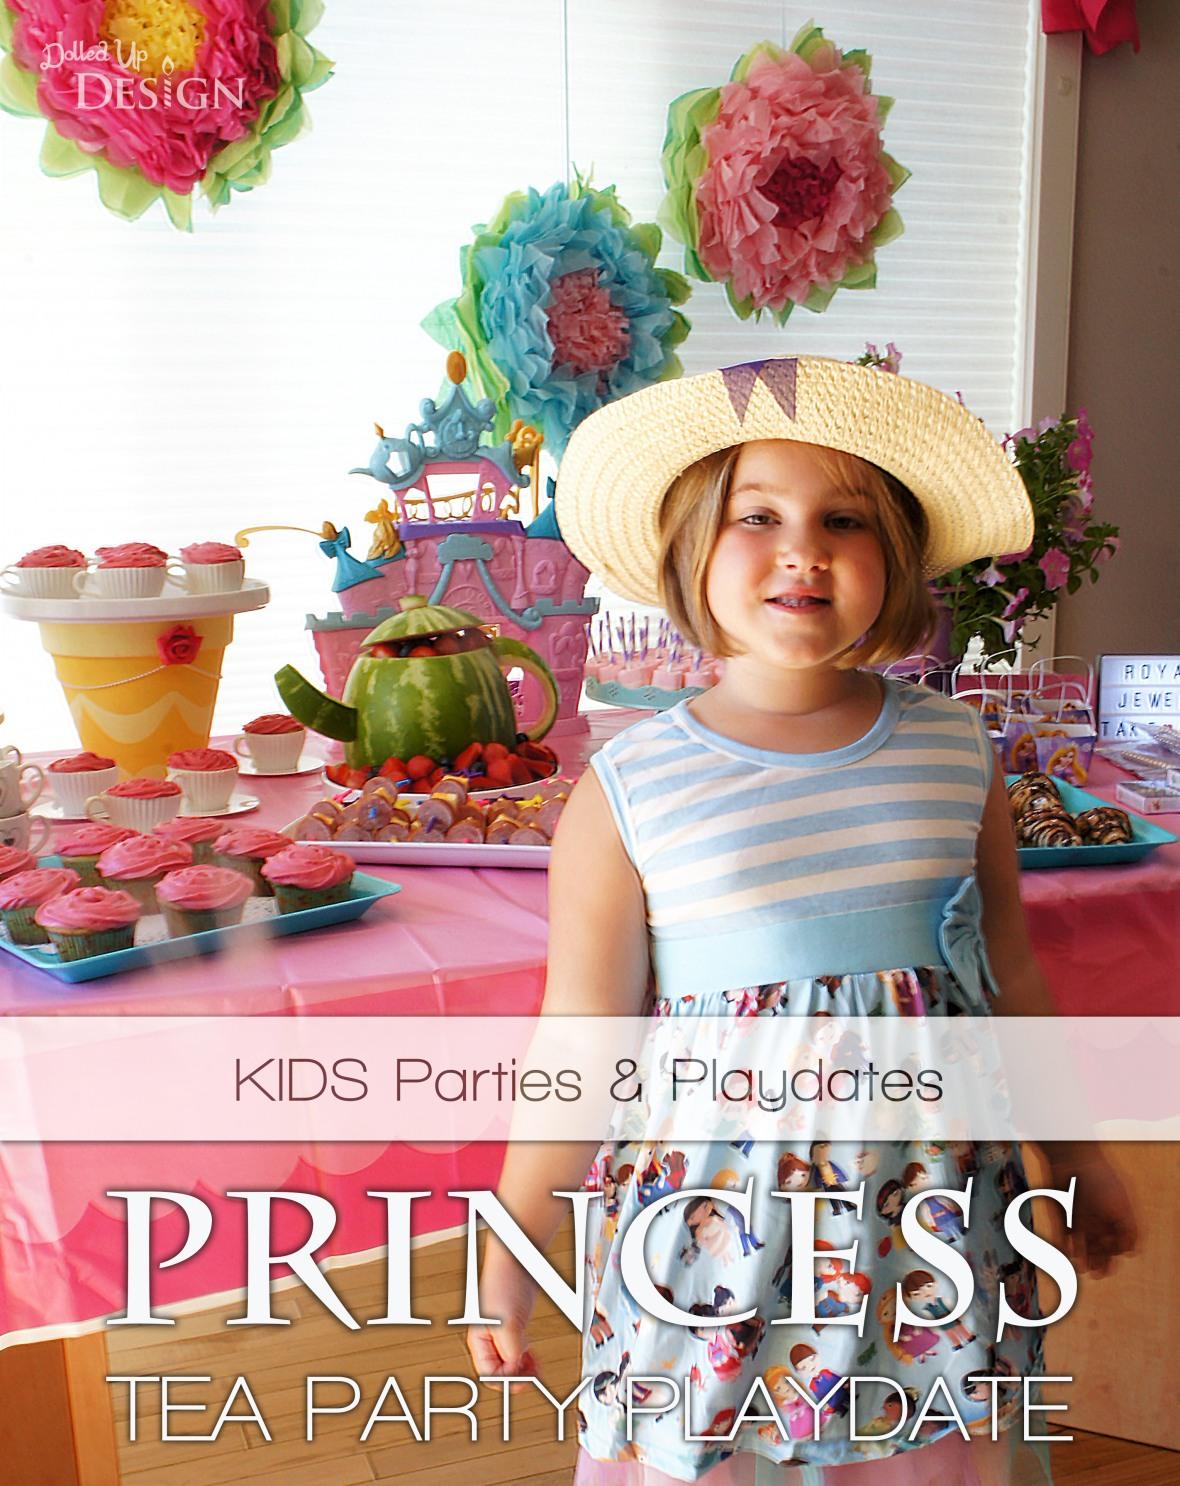 A Princess Tea Party Playdate